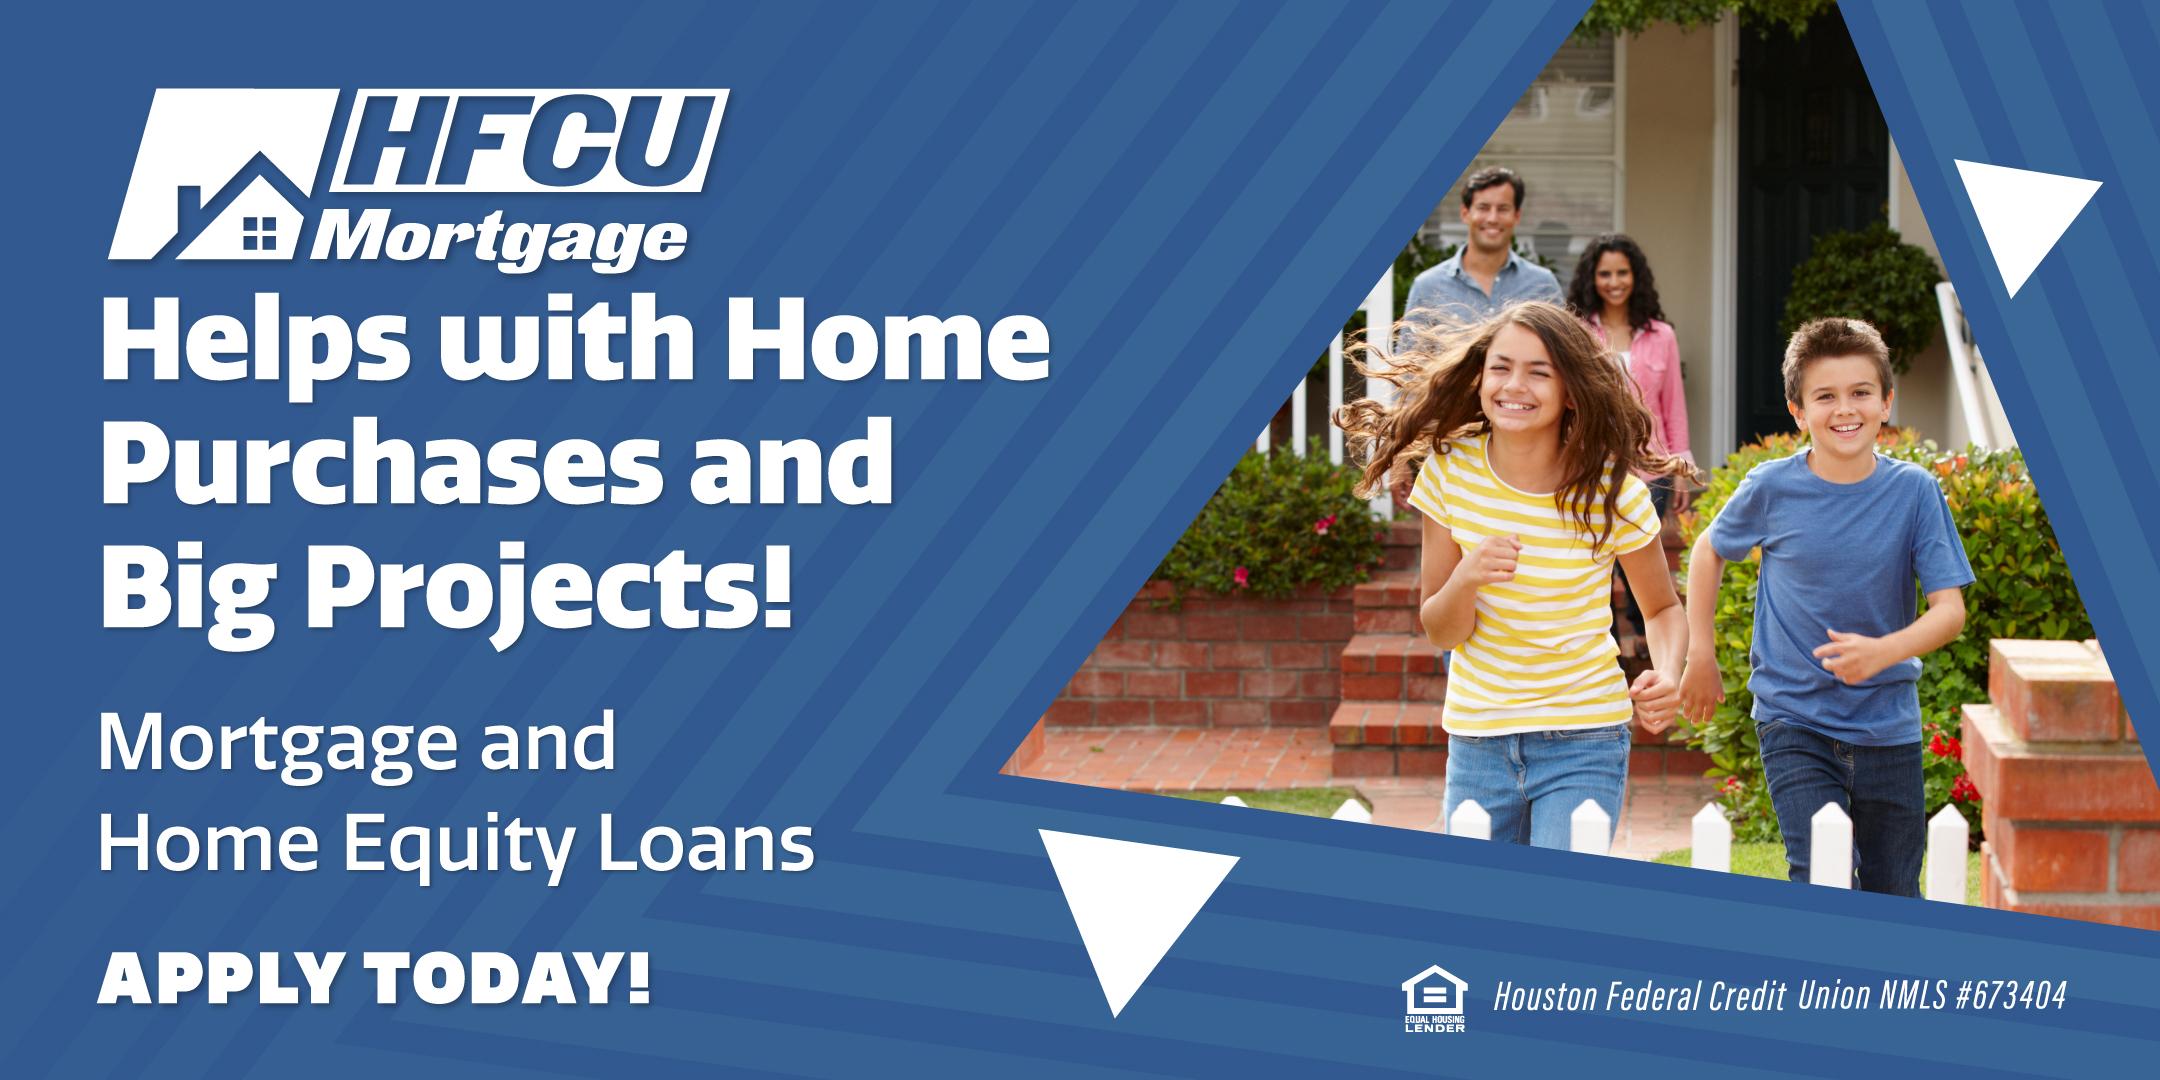 Bktmv2wltmsnc9yajq6r+mortgage-article-6